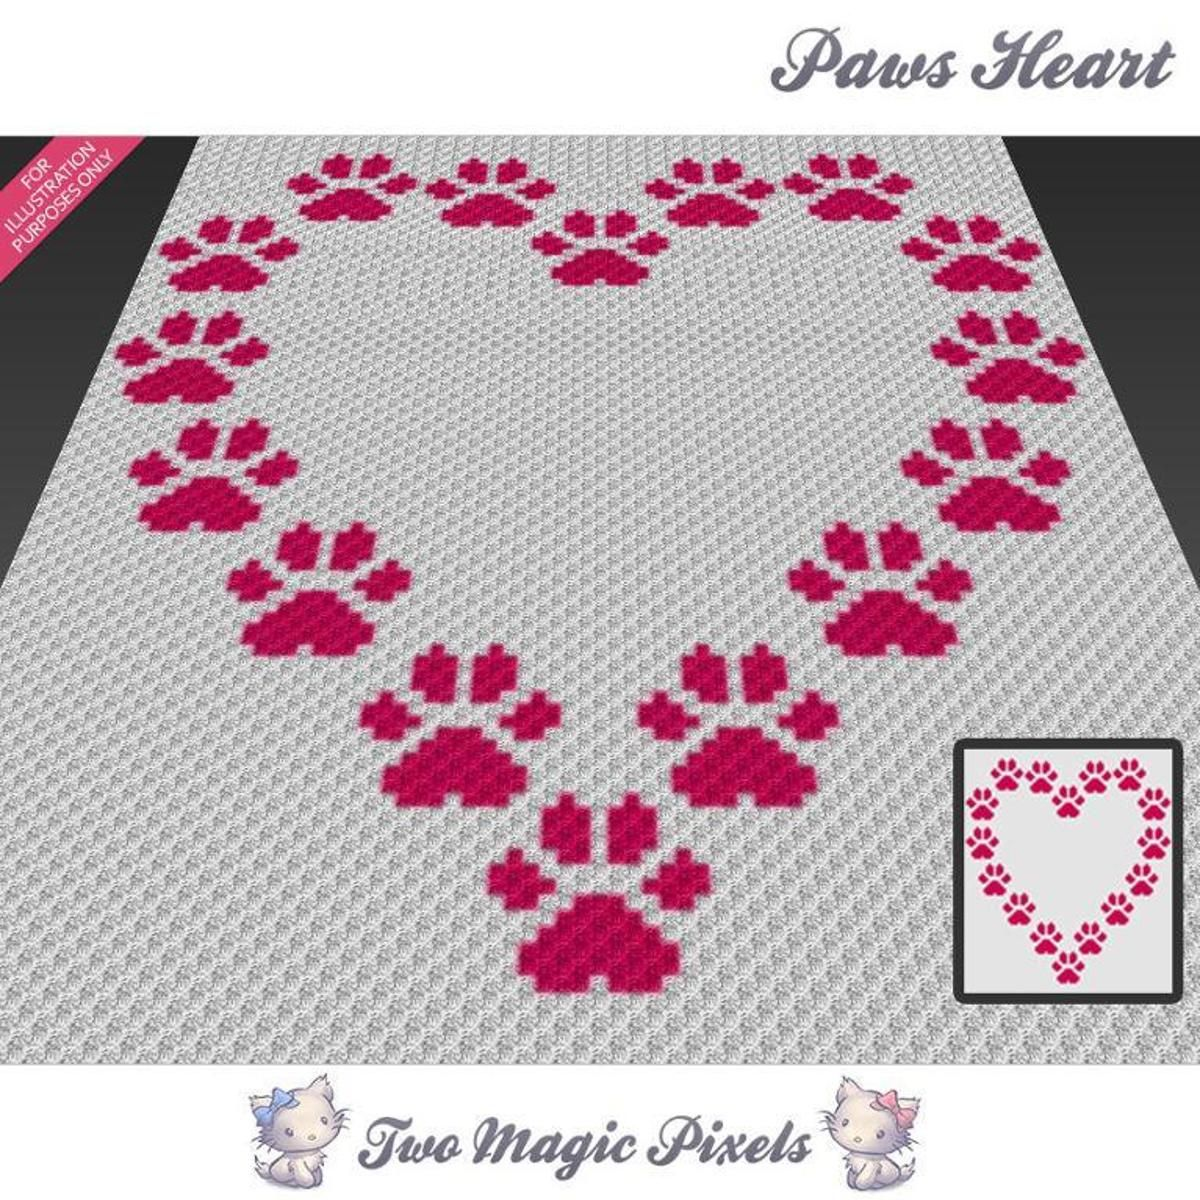 Paws Heart C2C Crochet Graph | Crochet, Fillet crochet and Afghans